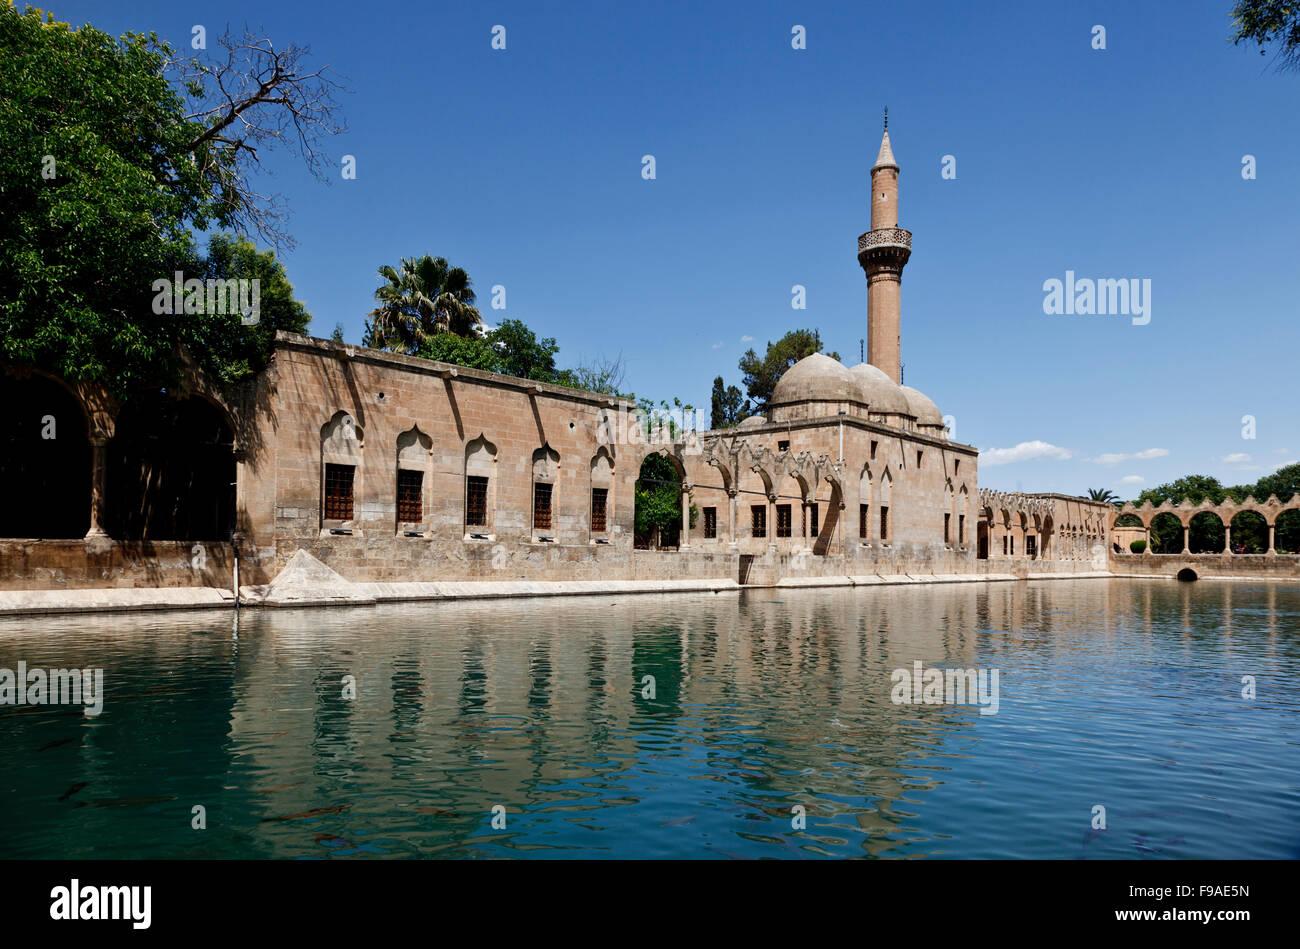 Halil-ur Rahman Mosque and Holy Lake, Baliklikoy, Sanliurfa, Turkey - Stock Image